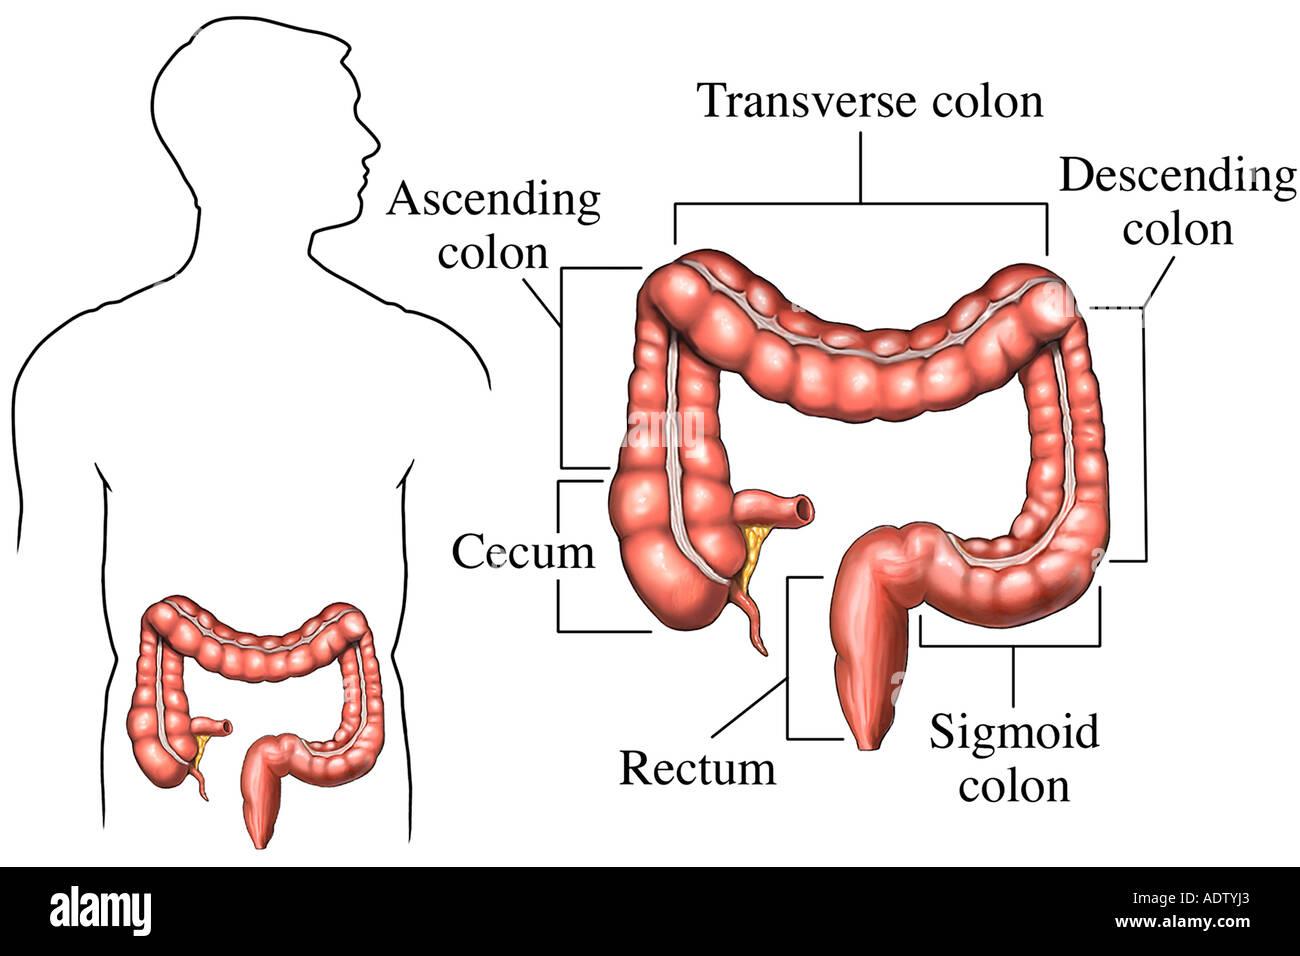 Normal Anatomy of the Large Intestine Stock Photo: 7710818 - Alamy